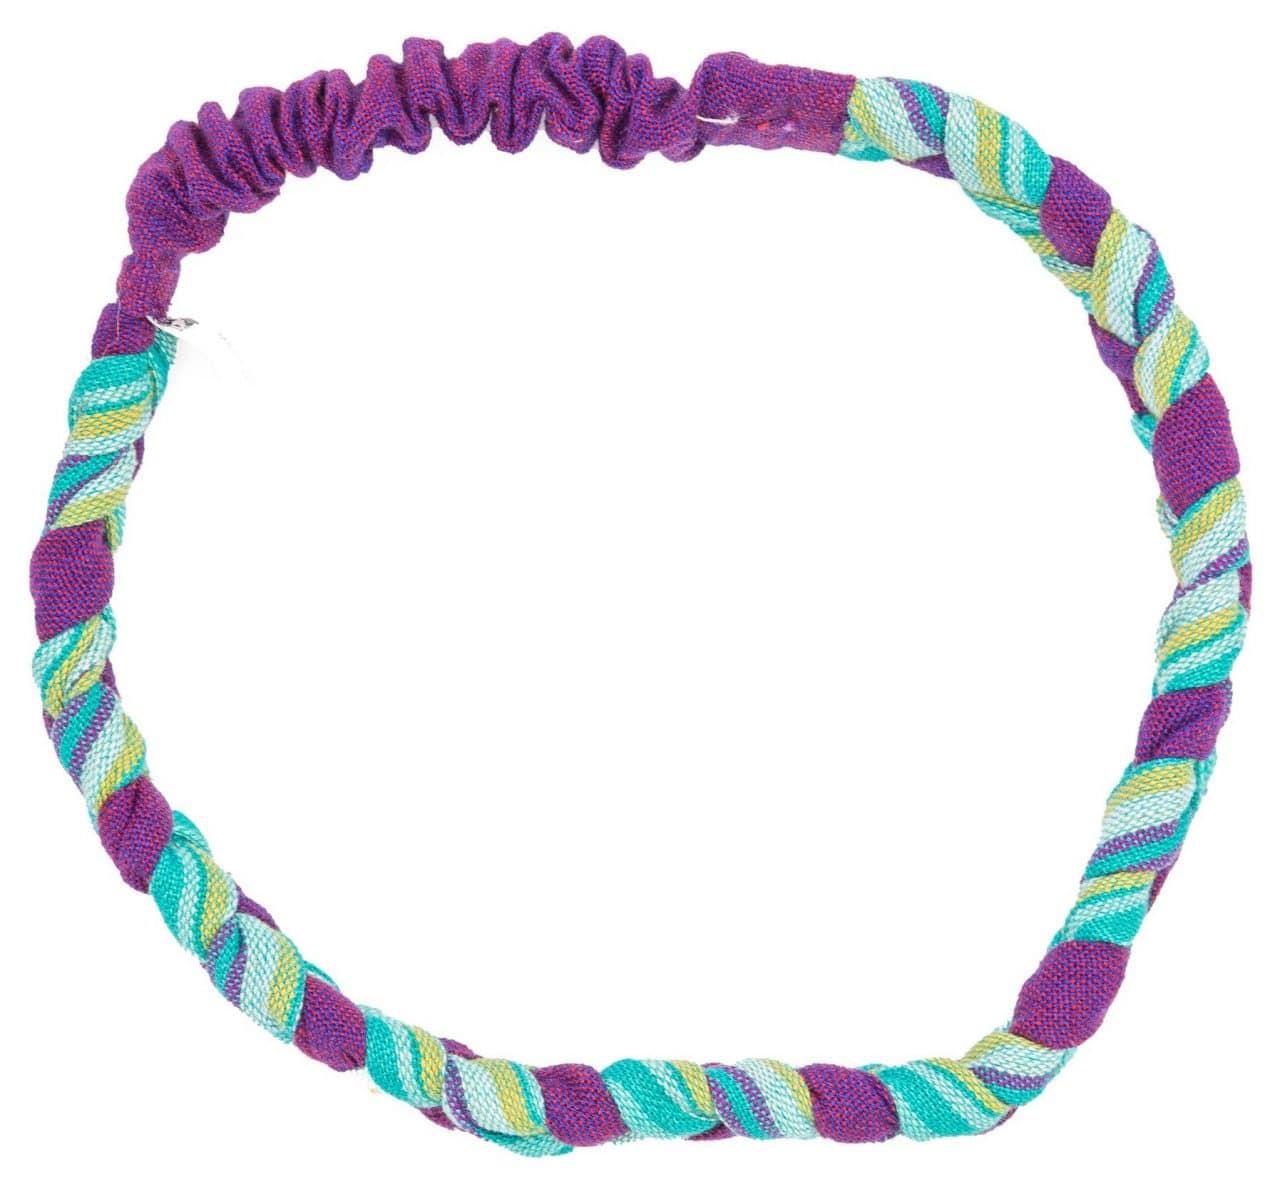 Braided Cotton Headband